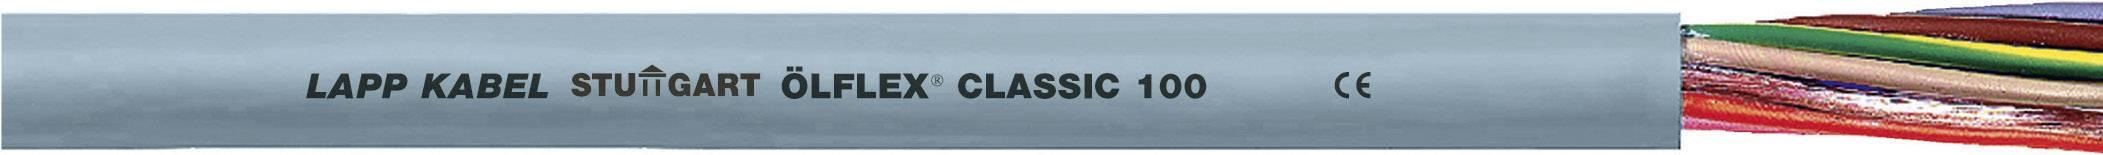 Kabel LappKabel Ölflex CLASSIC 100 5G0,5 (00100034), PVC, 6,2 mm, 500 V, šedá, 1000 m